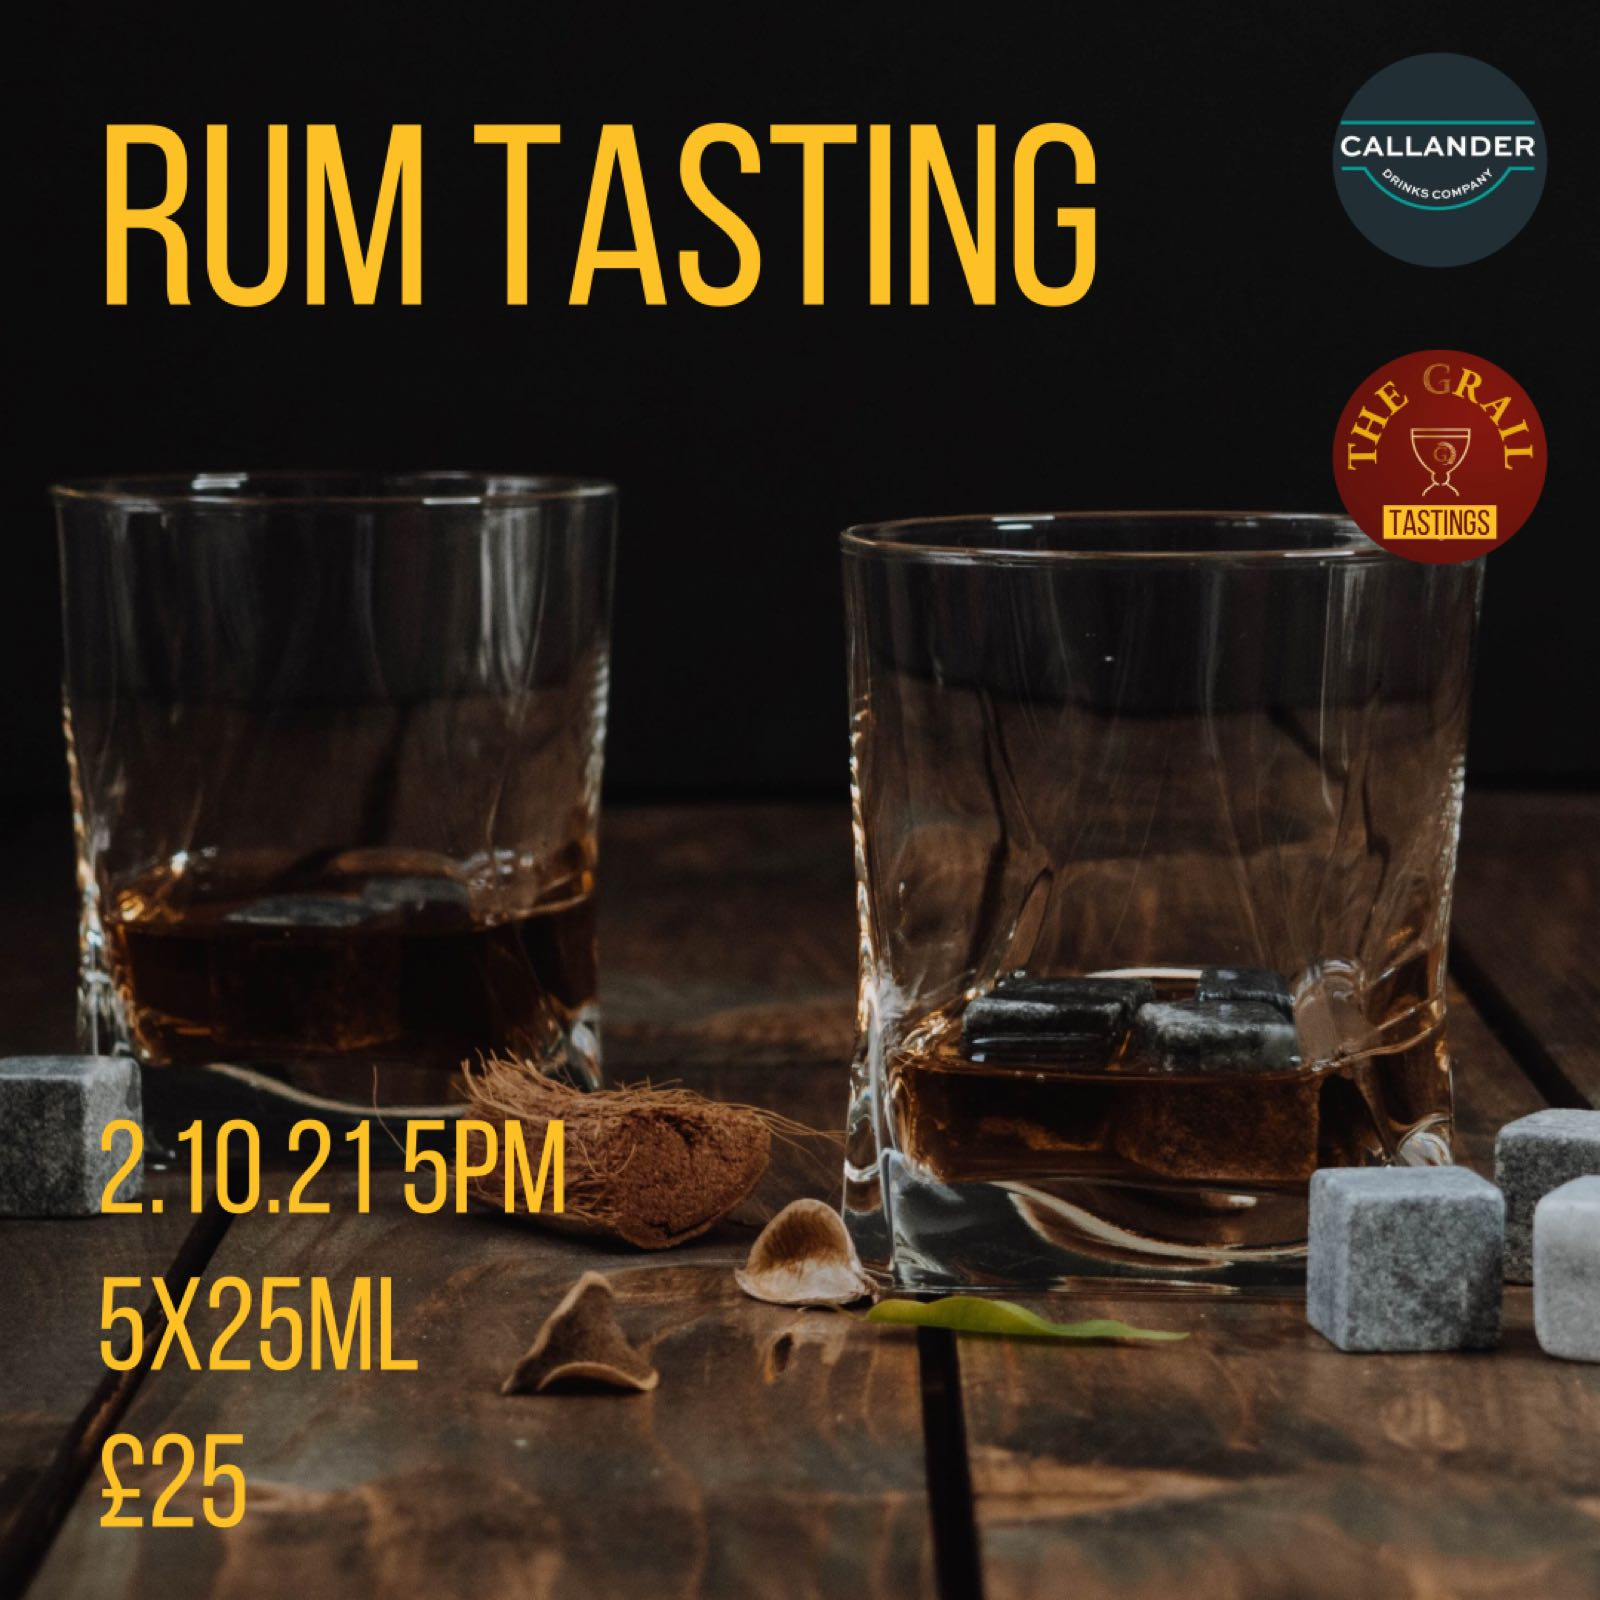 Rum Tasting 2.10.21